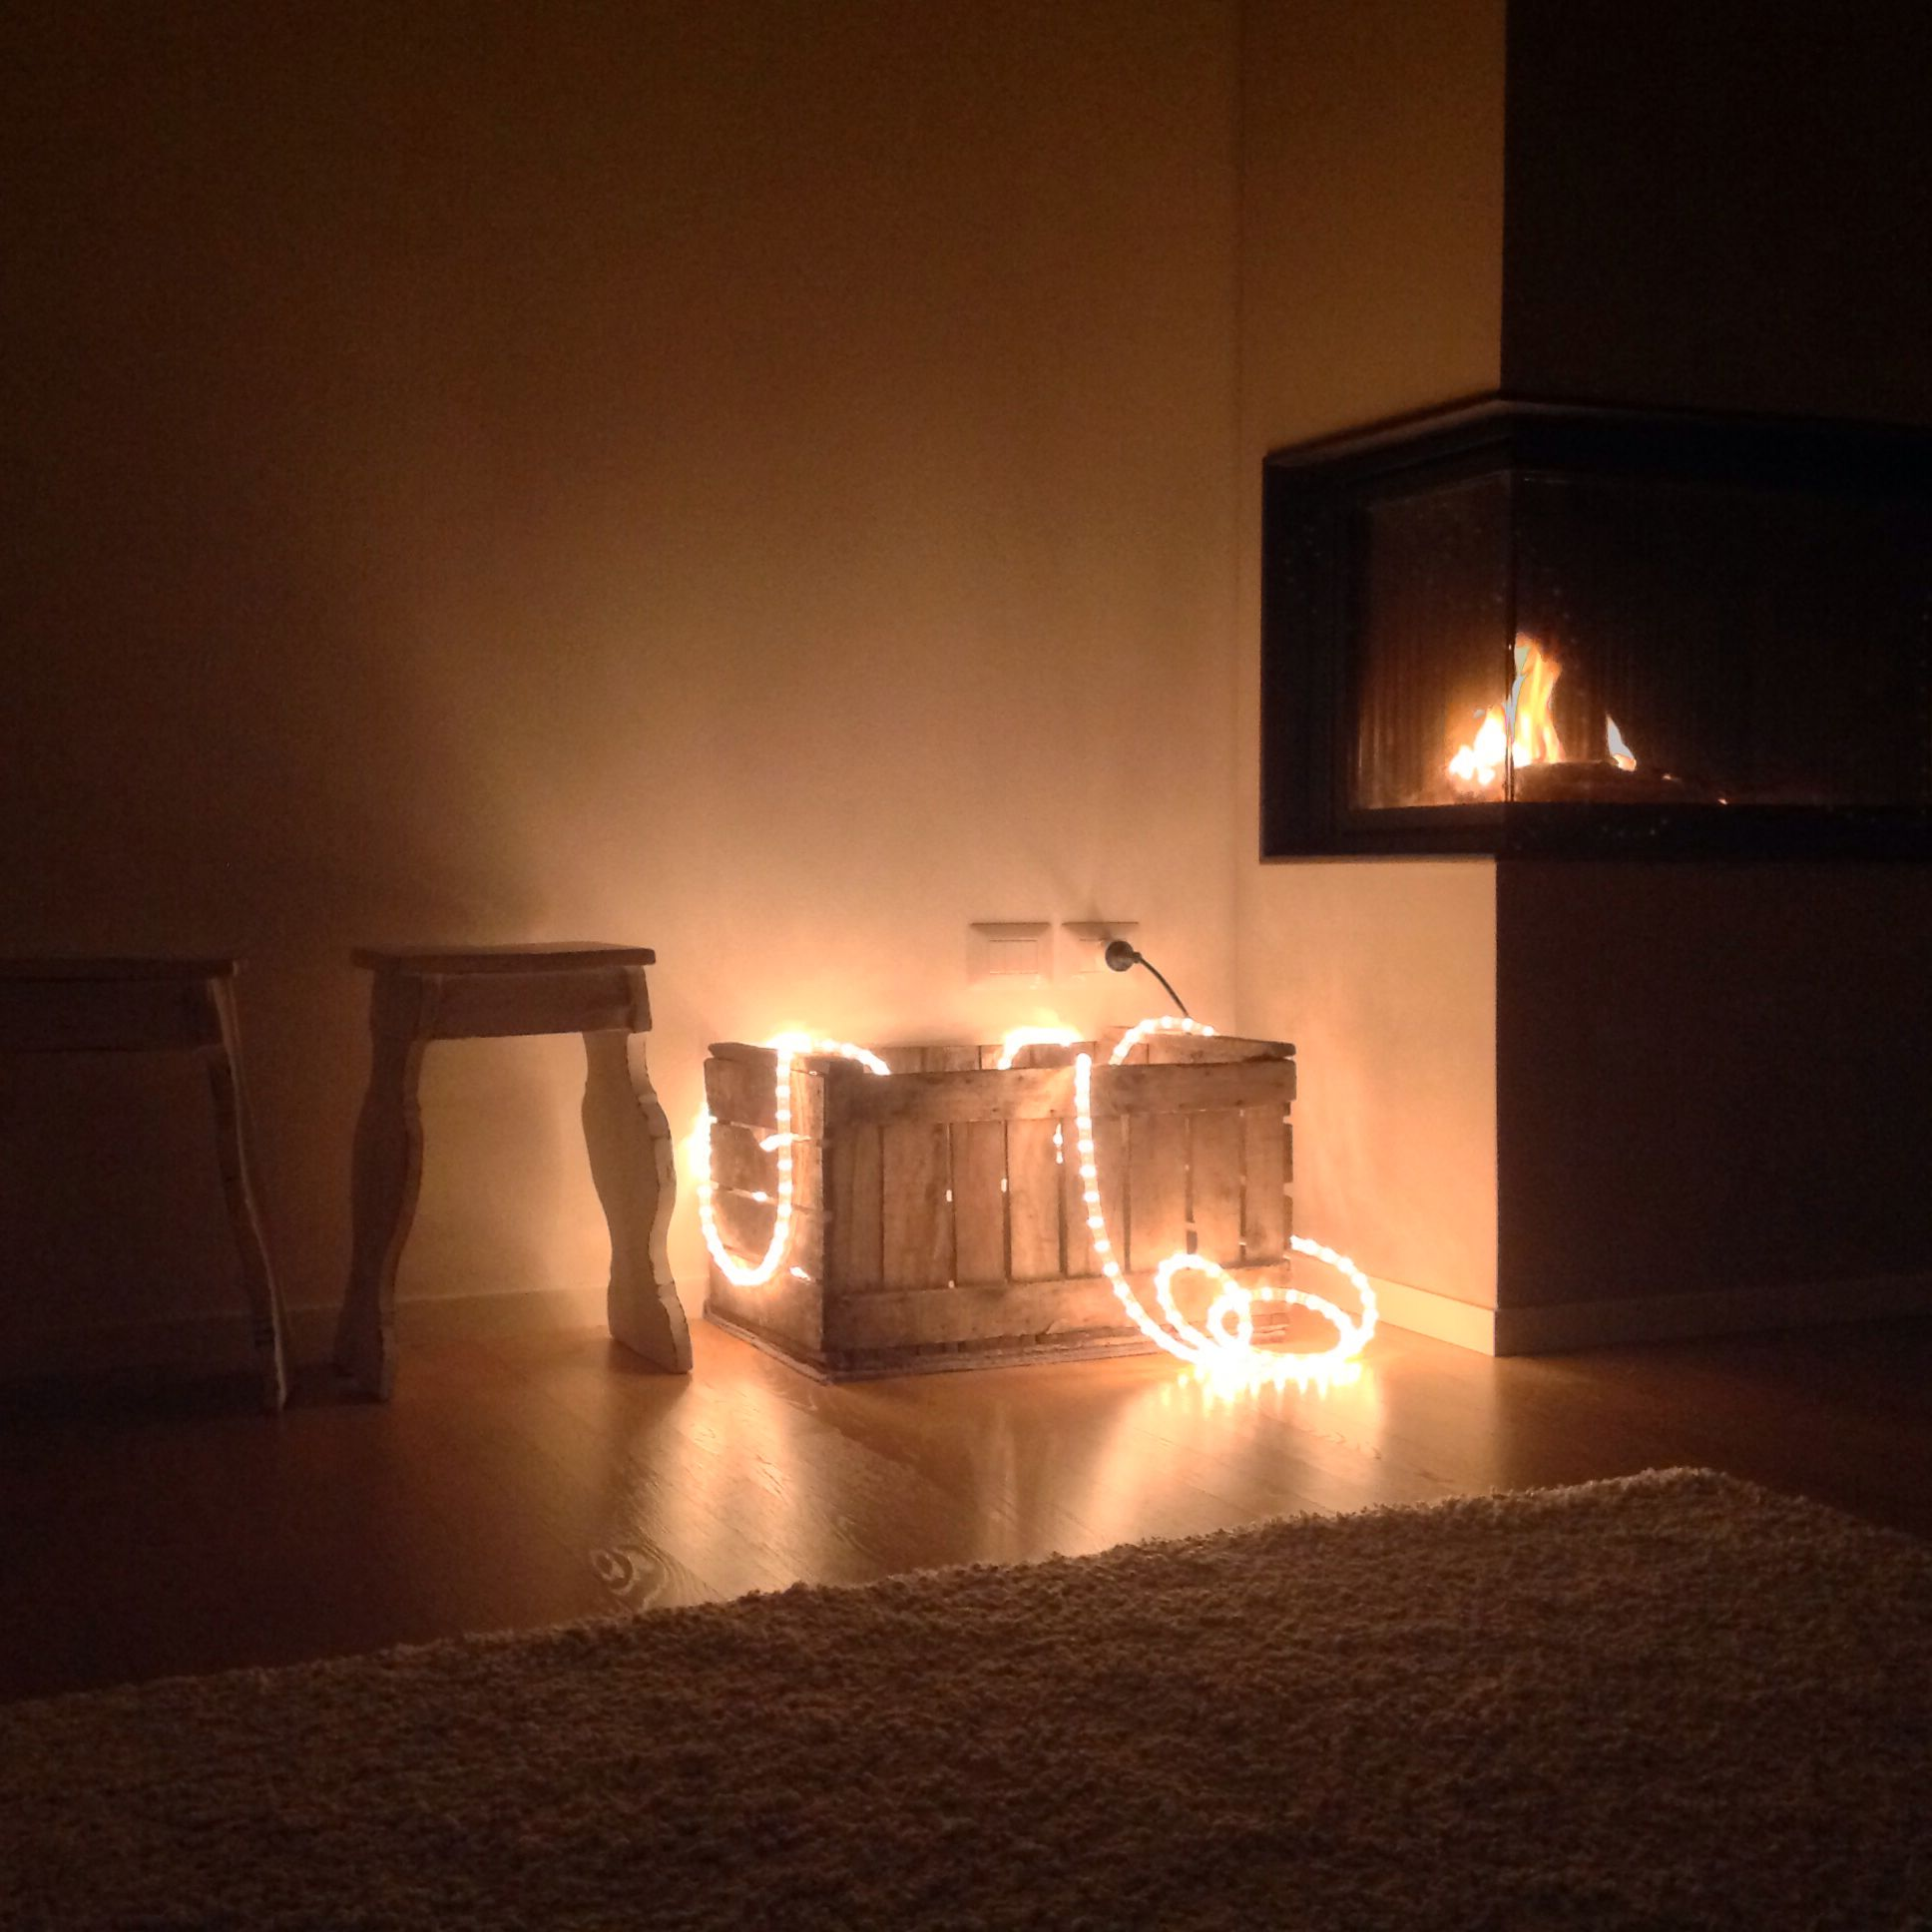 dp giuliadaponte project private villa fireplace light wood